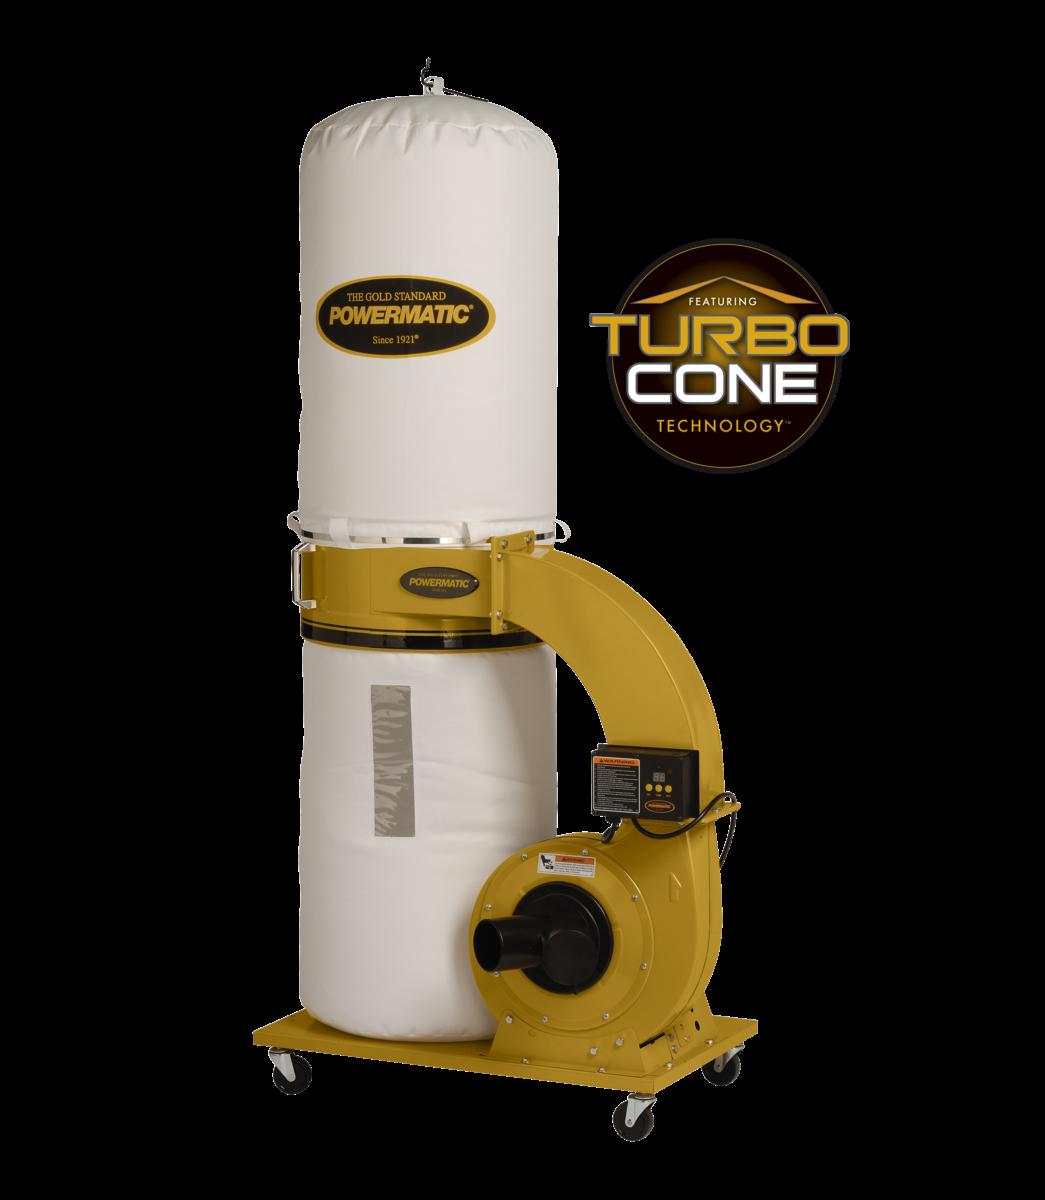 PM1300TX-BK Dust Collector, 1.75HP 1PH 115/230V, 30-Micron Bag Filter Kit